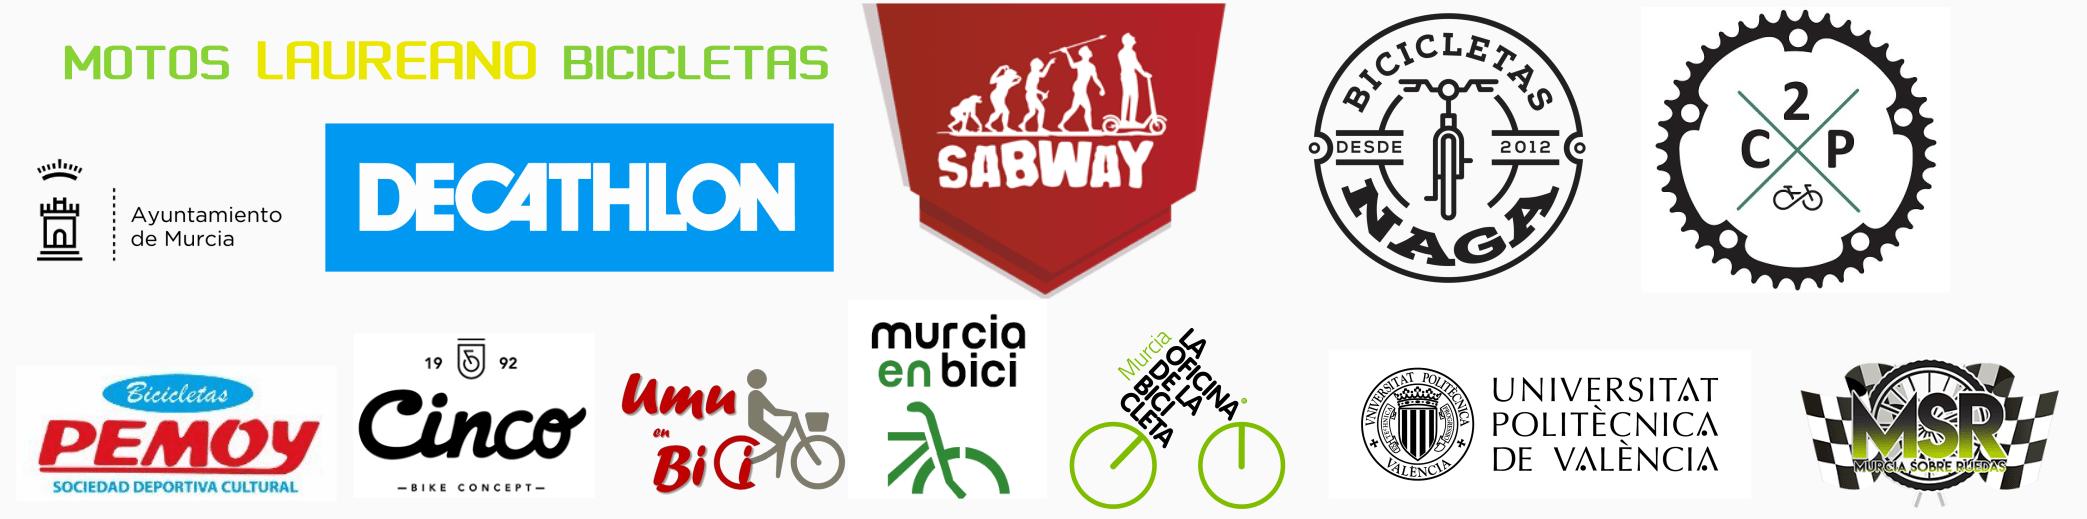 Proyecto ACHO MUÉVETE - Patrocinadores-Colaboradores